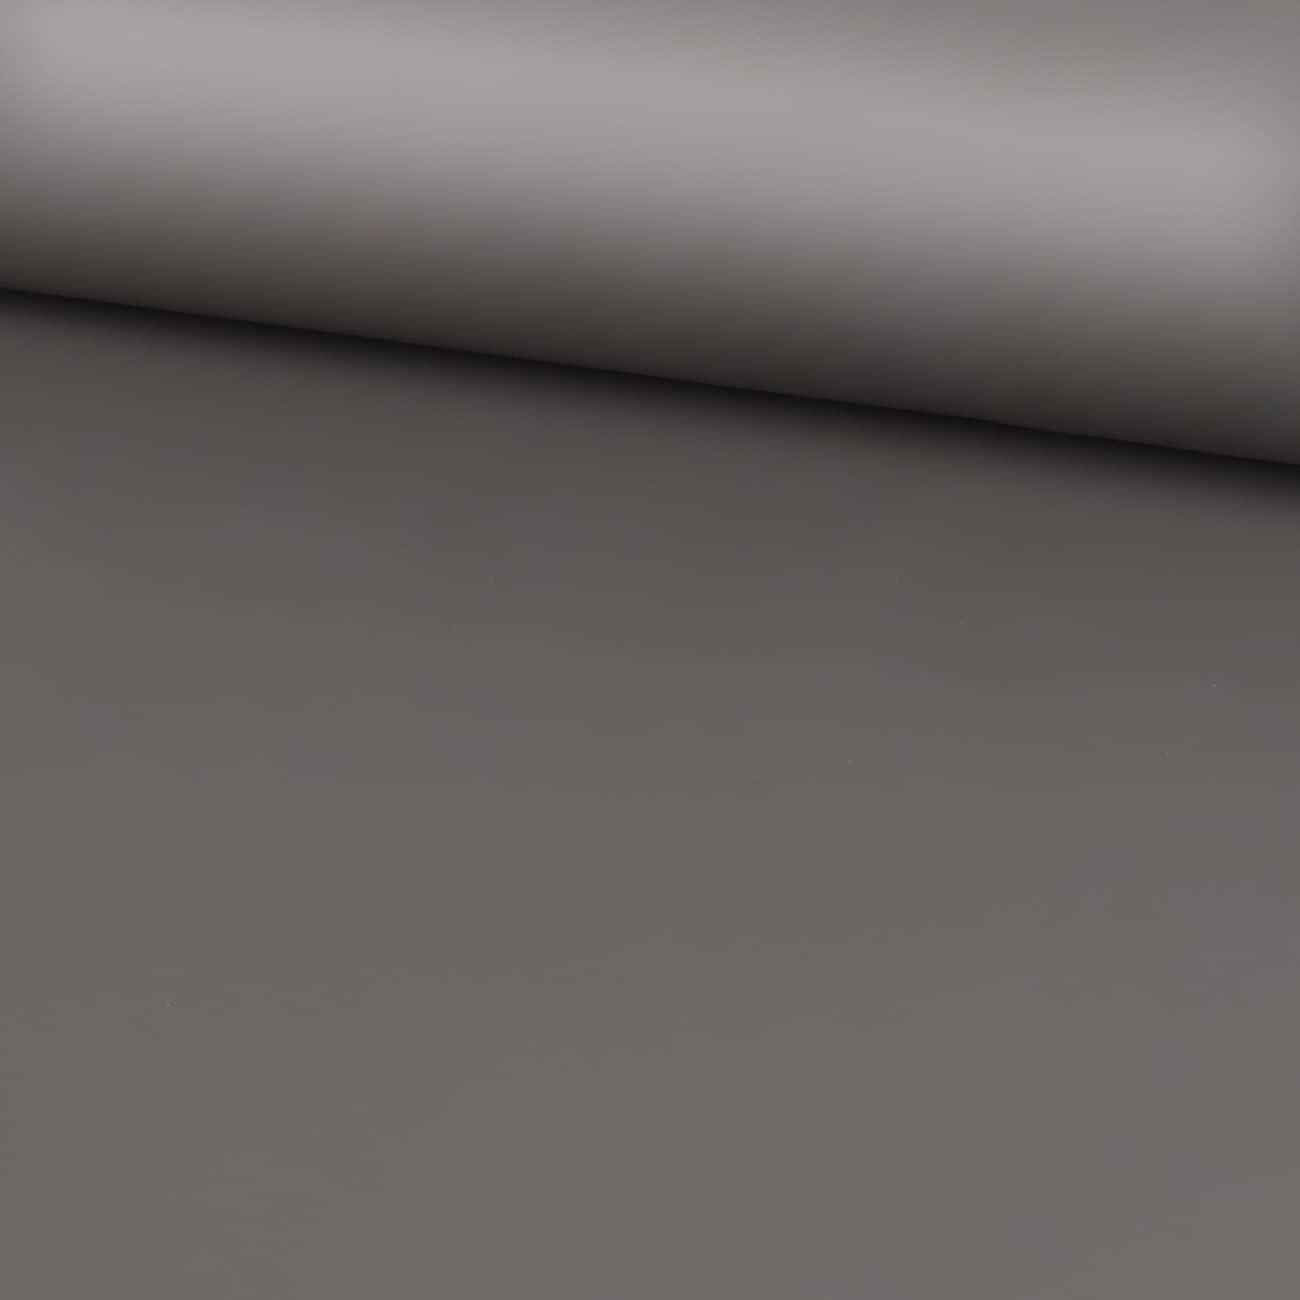 Decotalk Grey Peel and Stick discount Wallpaper 120 Bedroom Wall x Max 48% OFF 30 for